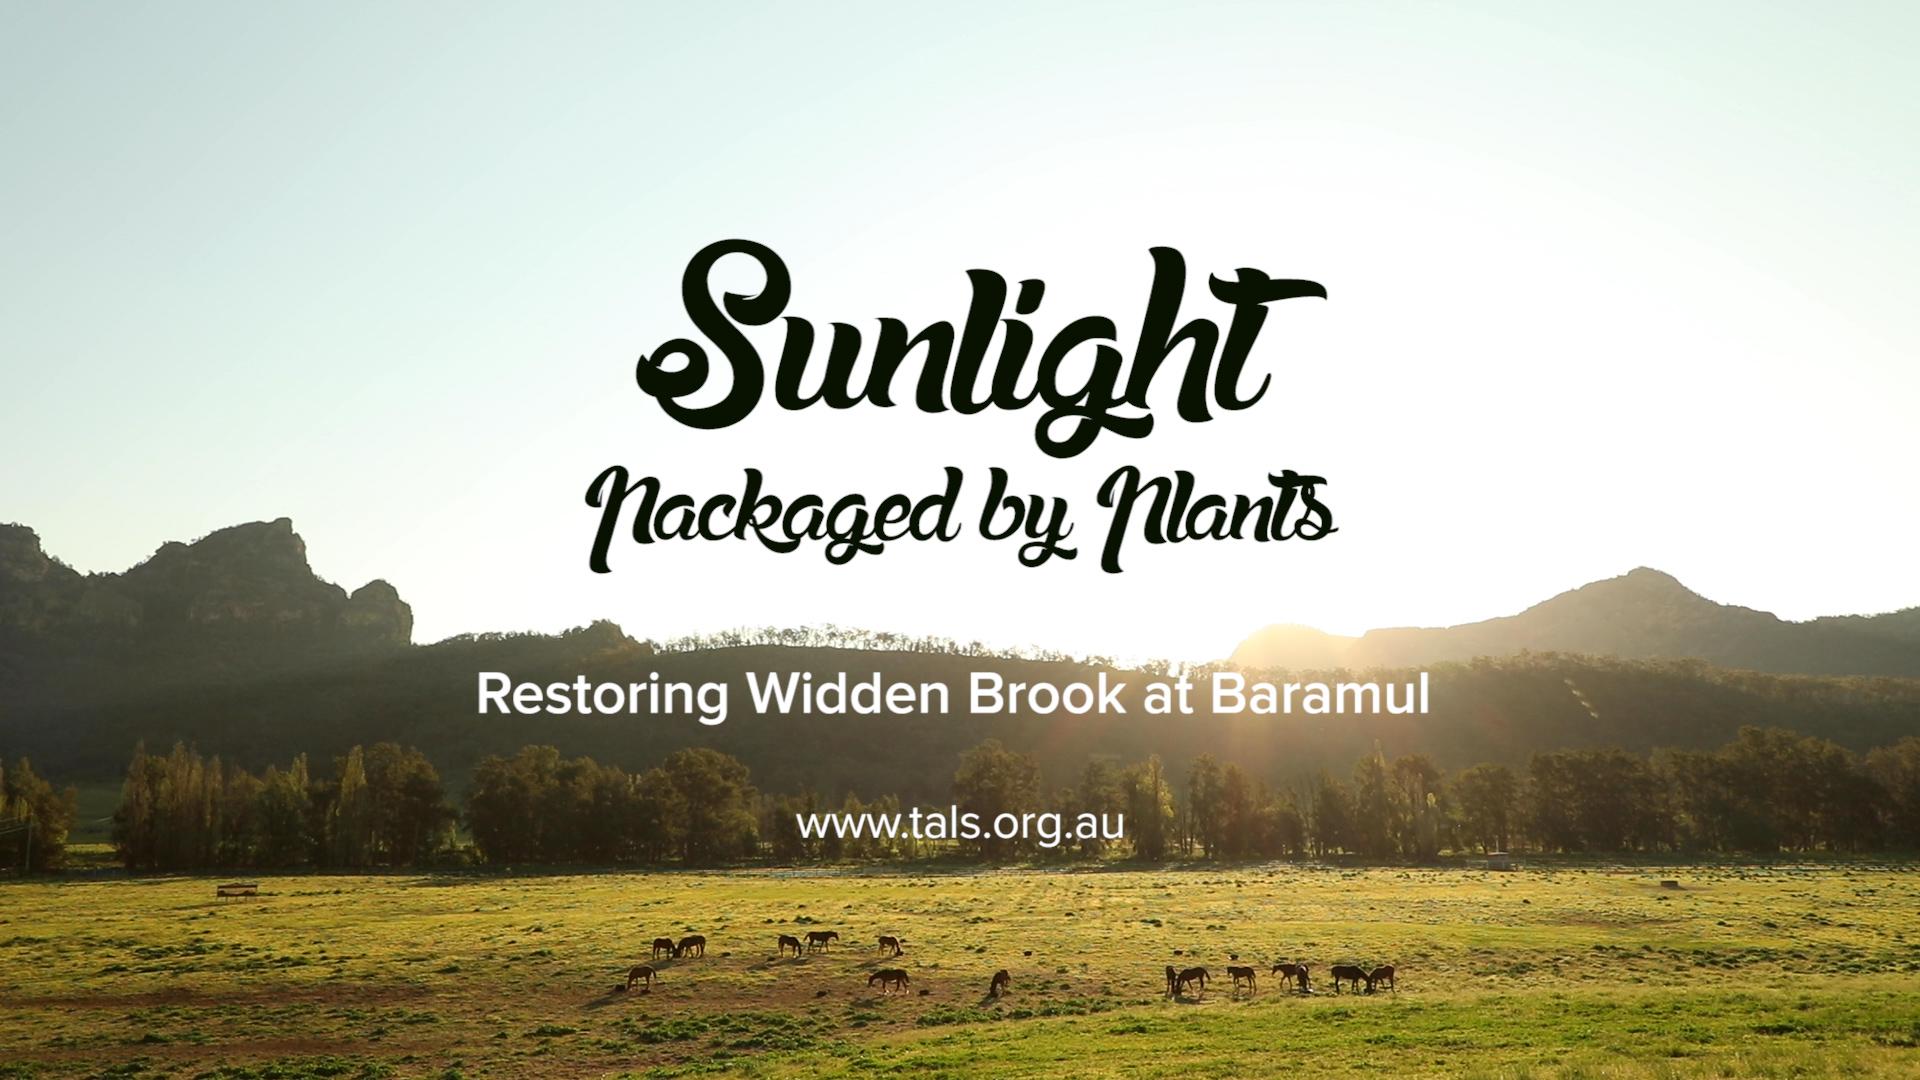 Sunlight Packaged by Plants - Peter Andrews restoring Widden Brook at Baramul